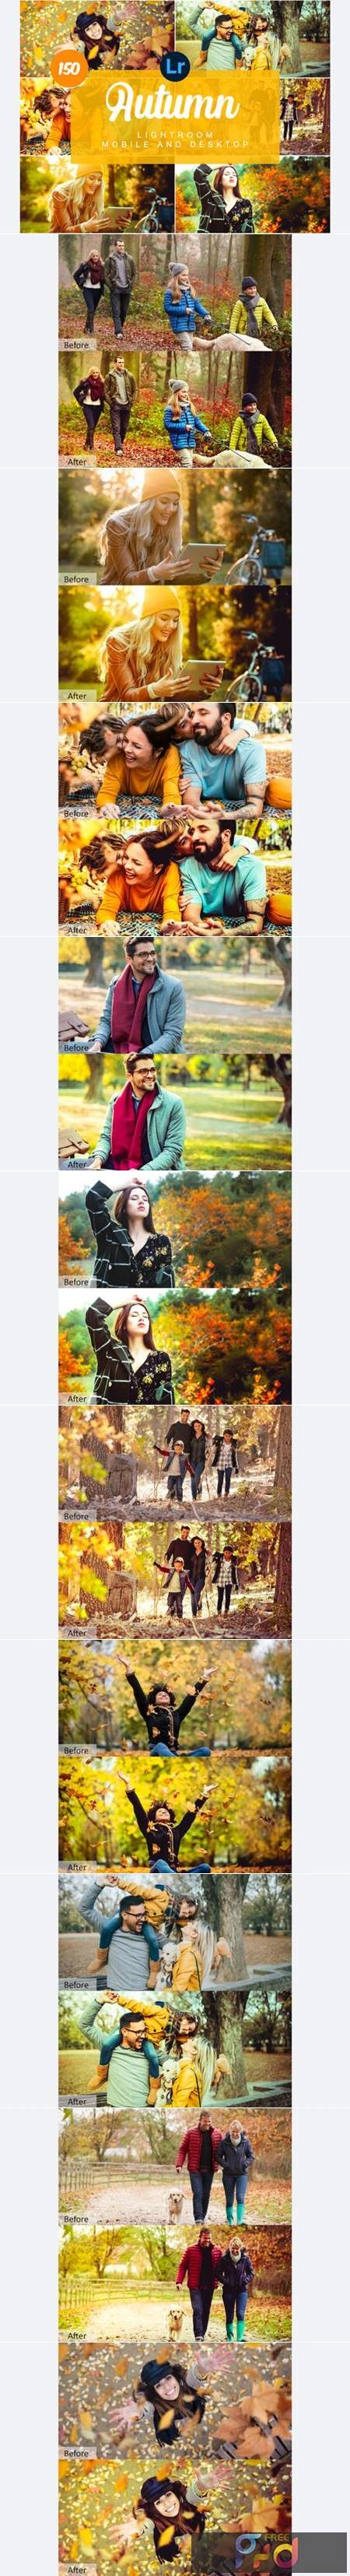 Autumn Mobile and Desktop PRESETS 7431794 1